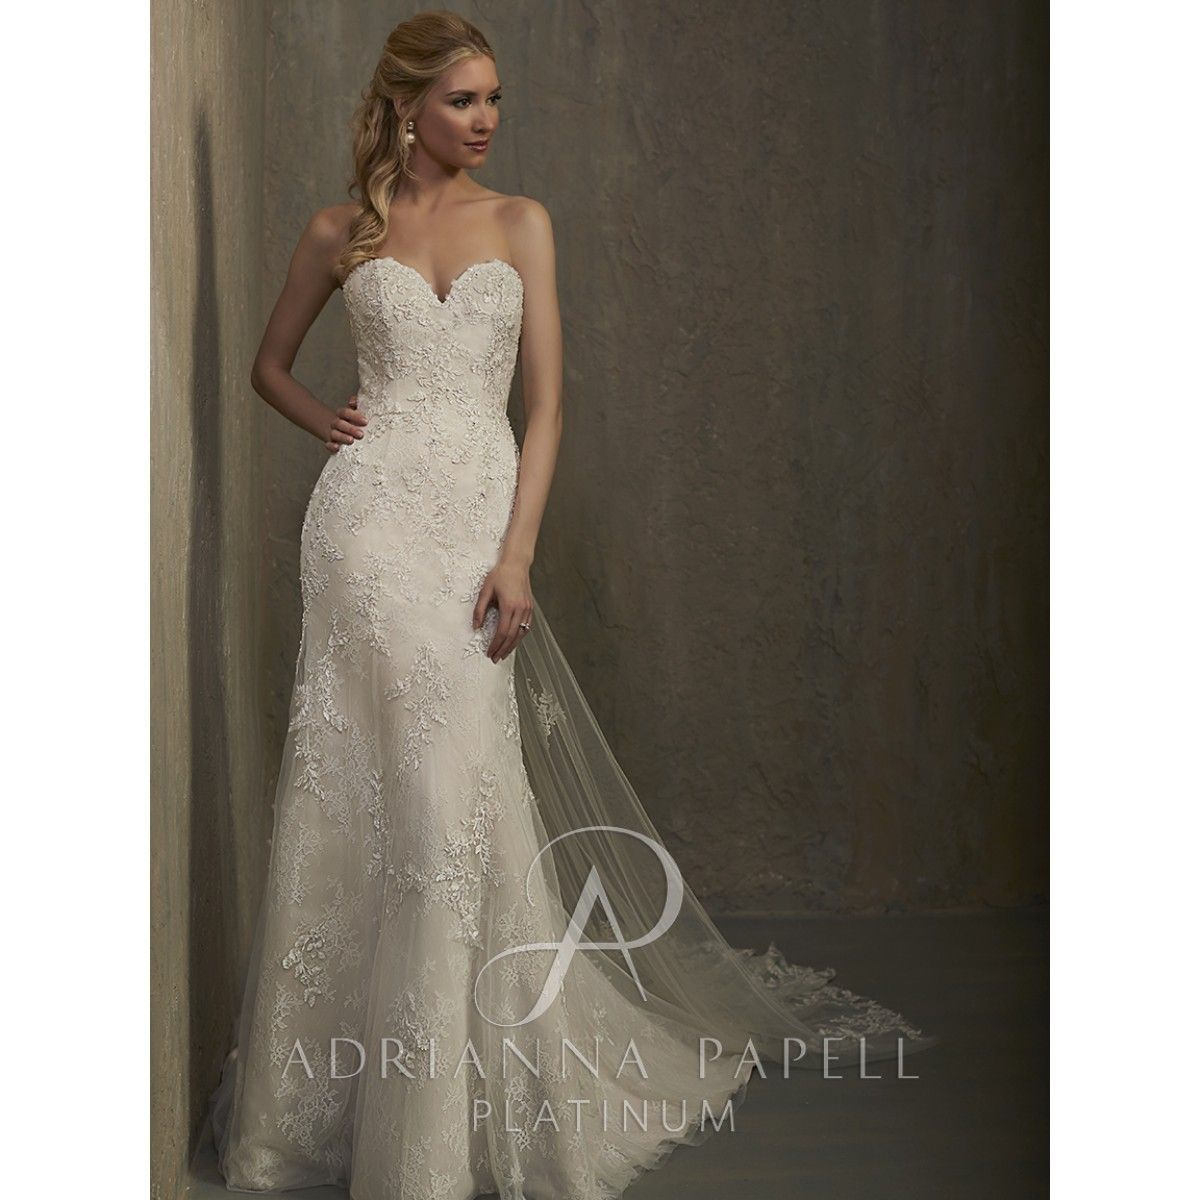 Platinum edition wedding dresses  New  Style Isabella  Adrianna Papell Platinum  LoveStory